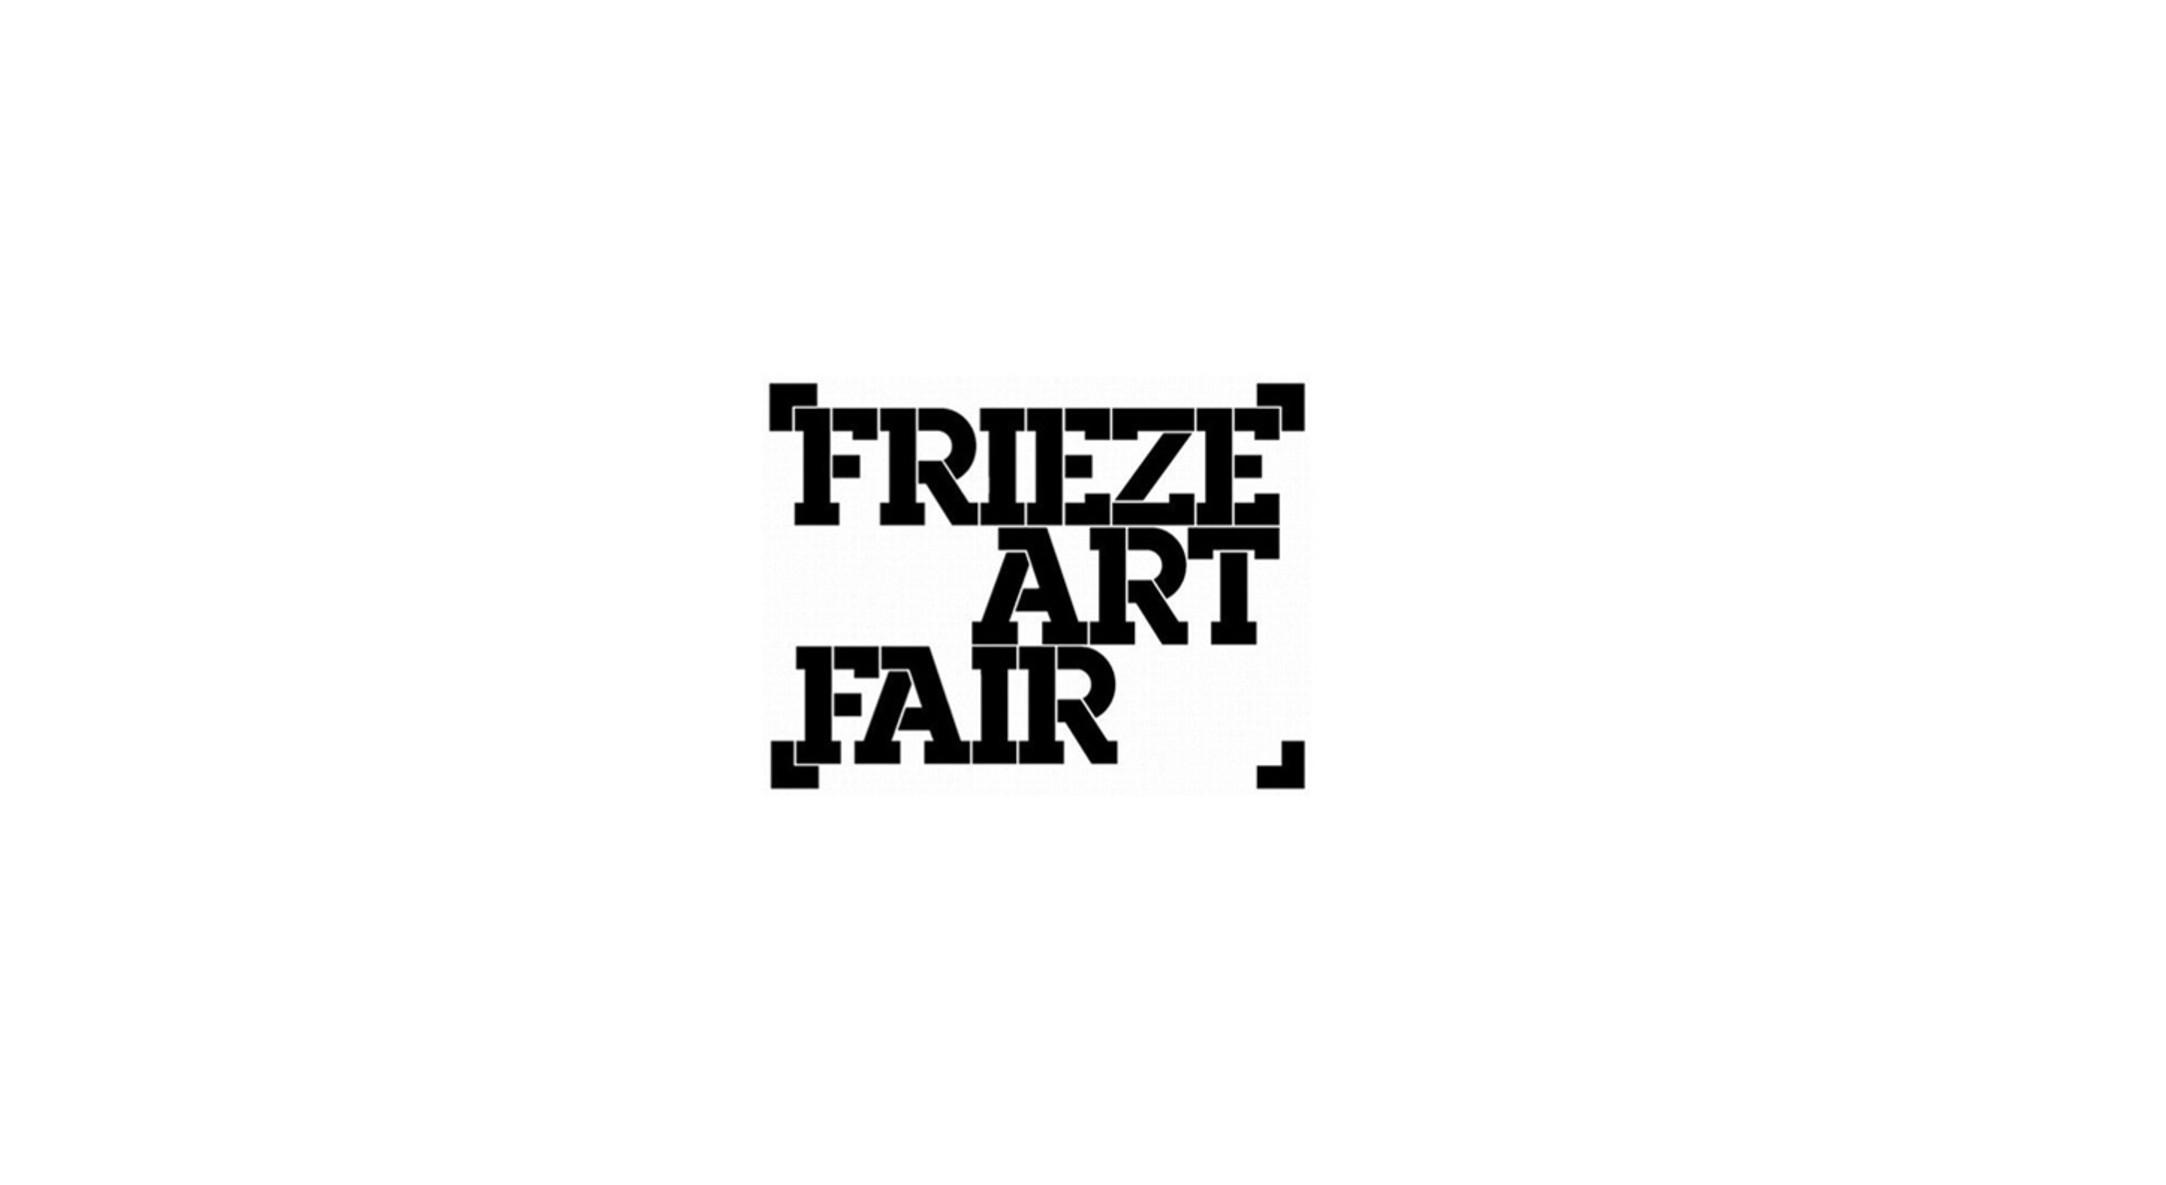 Frieze Art Fair logo